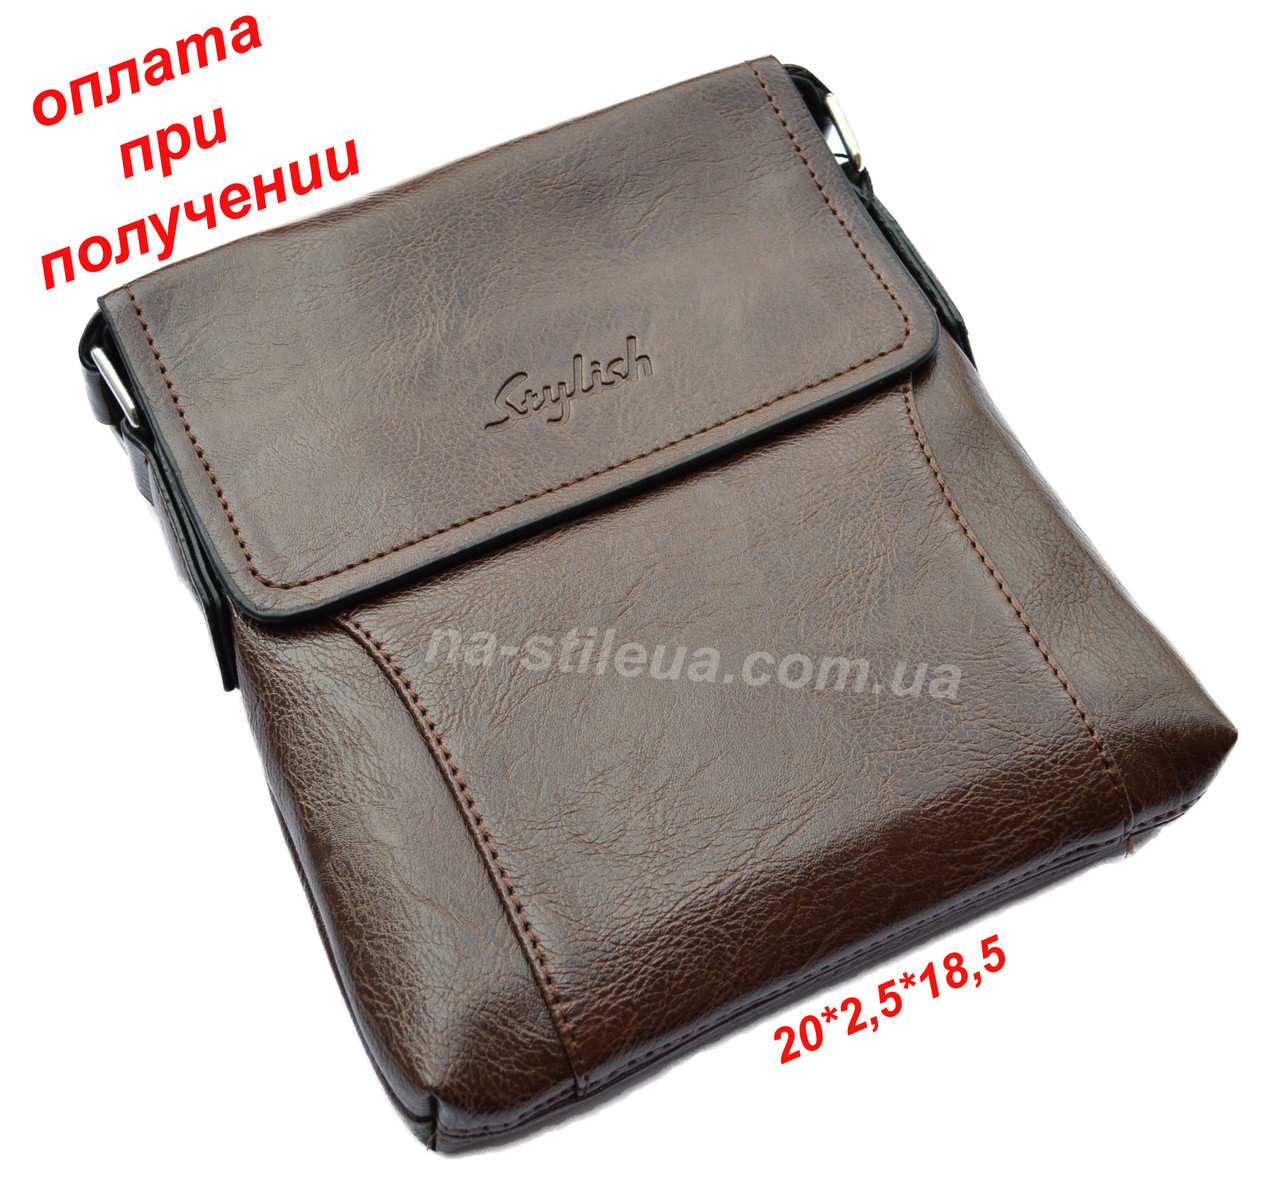 fc86f36073e7 Мужская чоловіча кожаная сумка барсетка через плечо Stylish: продажа ...